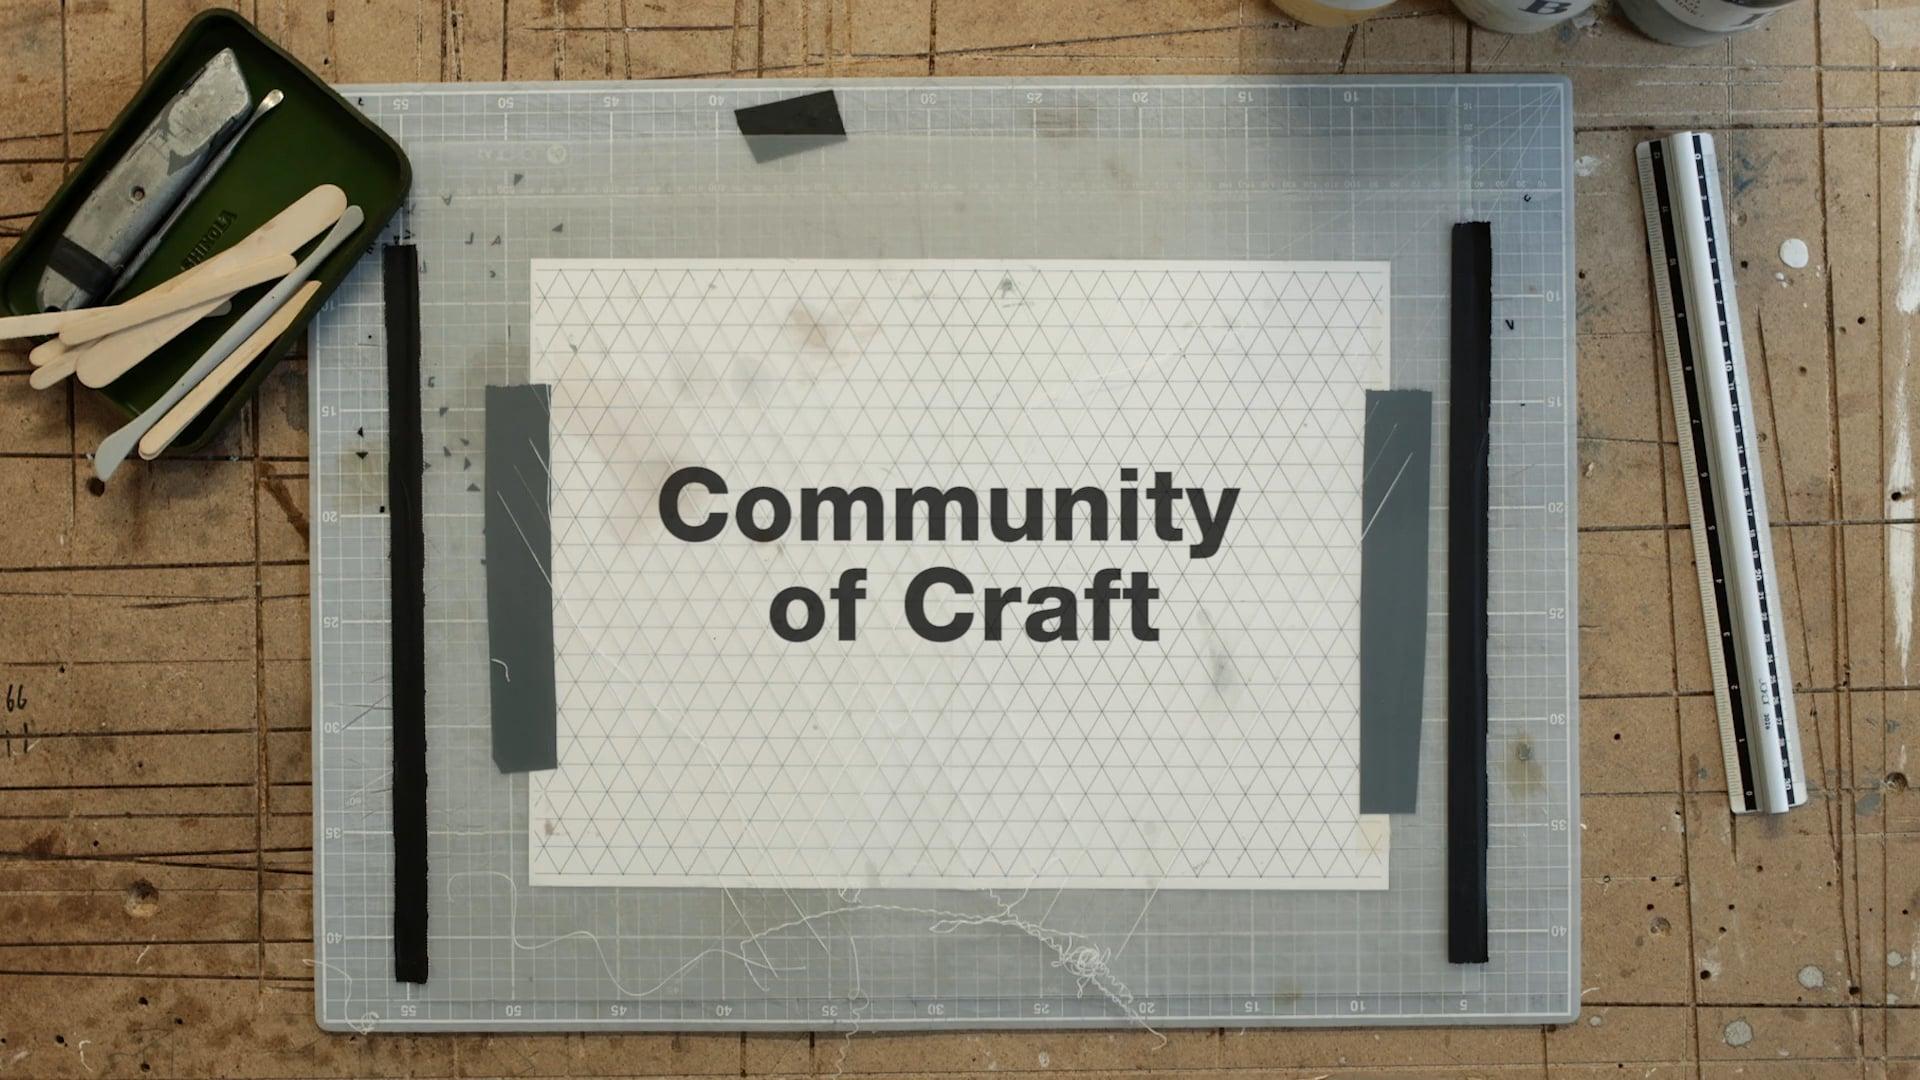 Jocks&Nerds - Shinola 'Community of Craft' – Phil Cuttance-HD